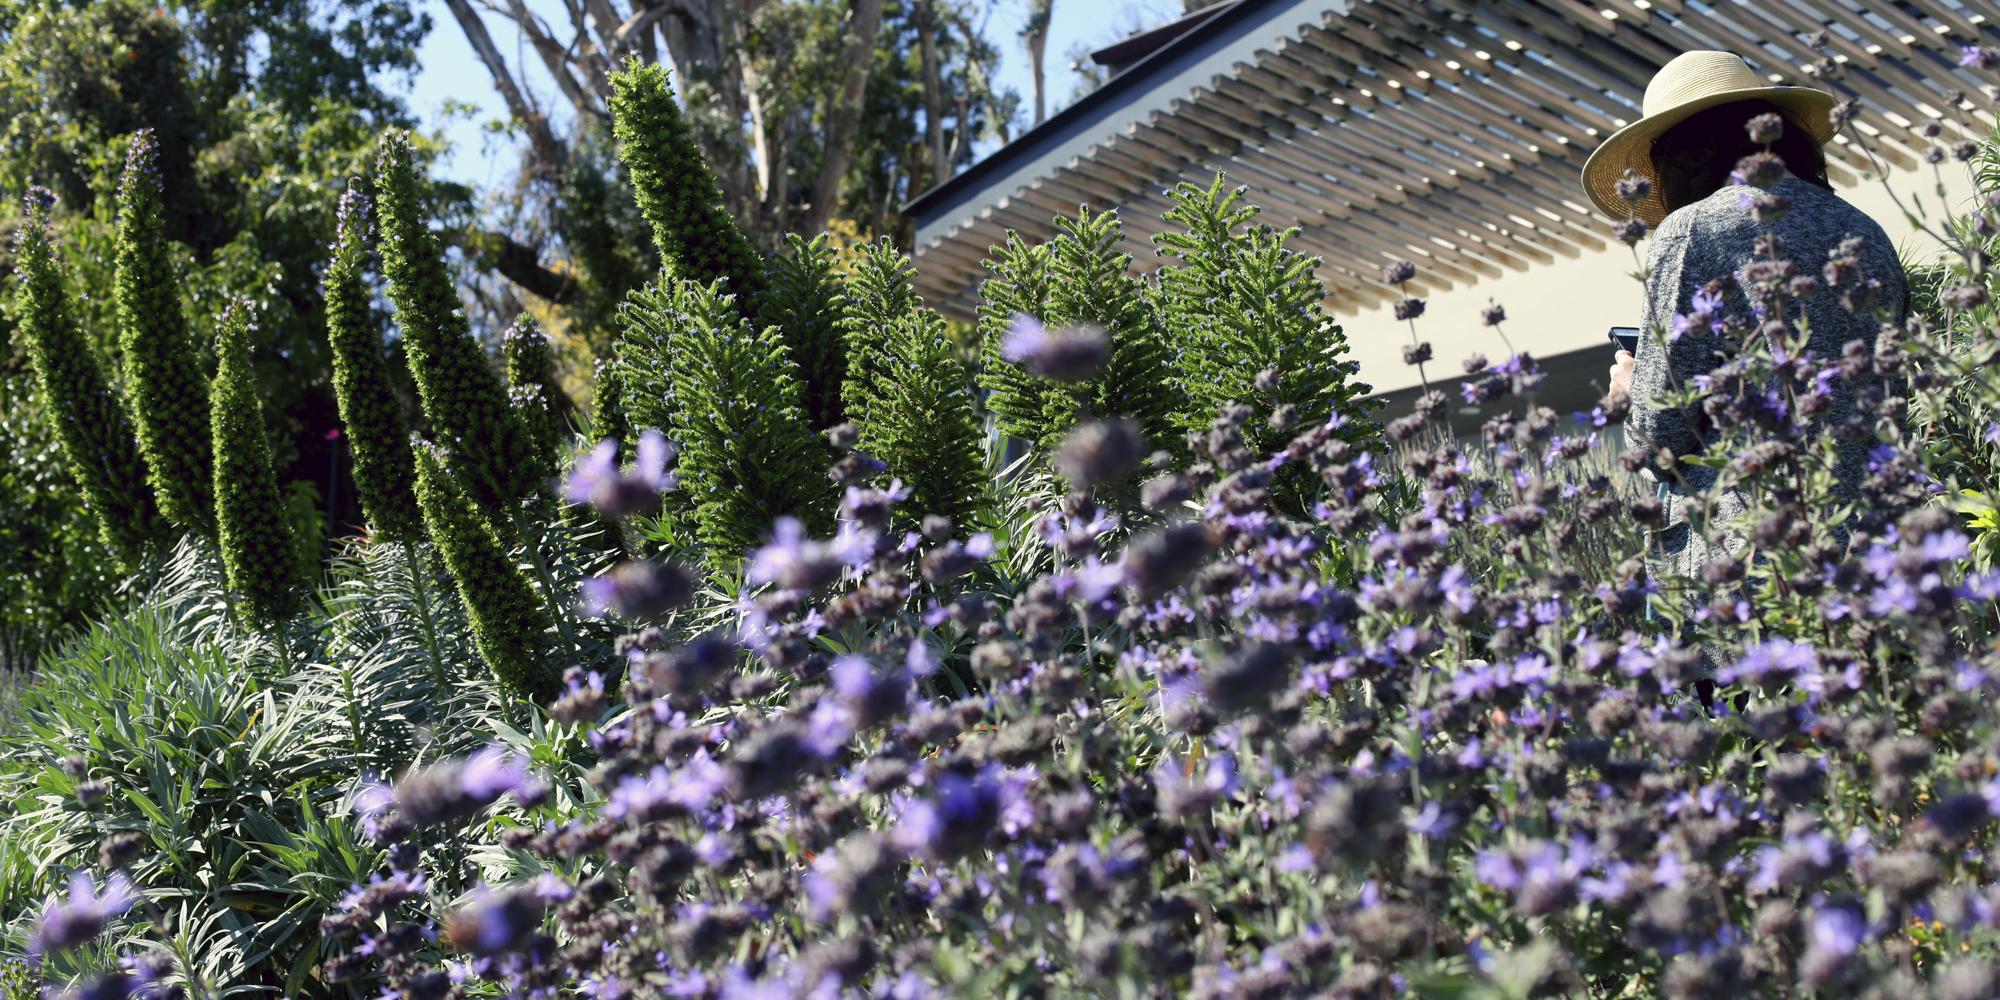 Stephen_Billings_Landscape_Architecture_Santa_Monica_2